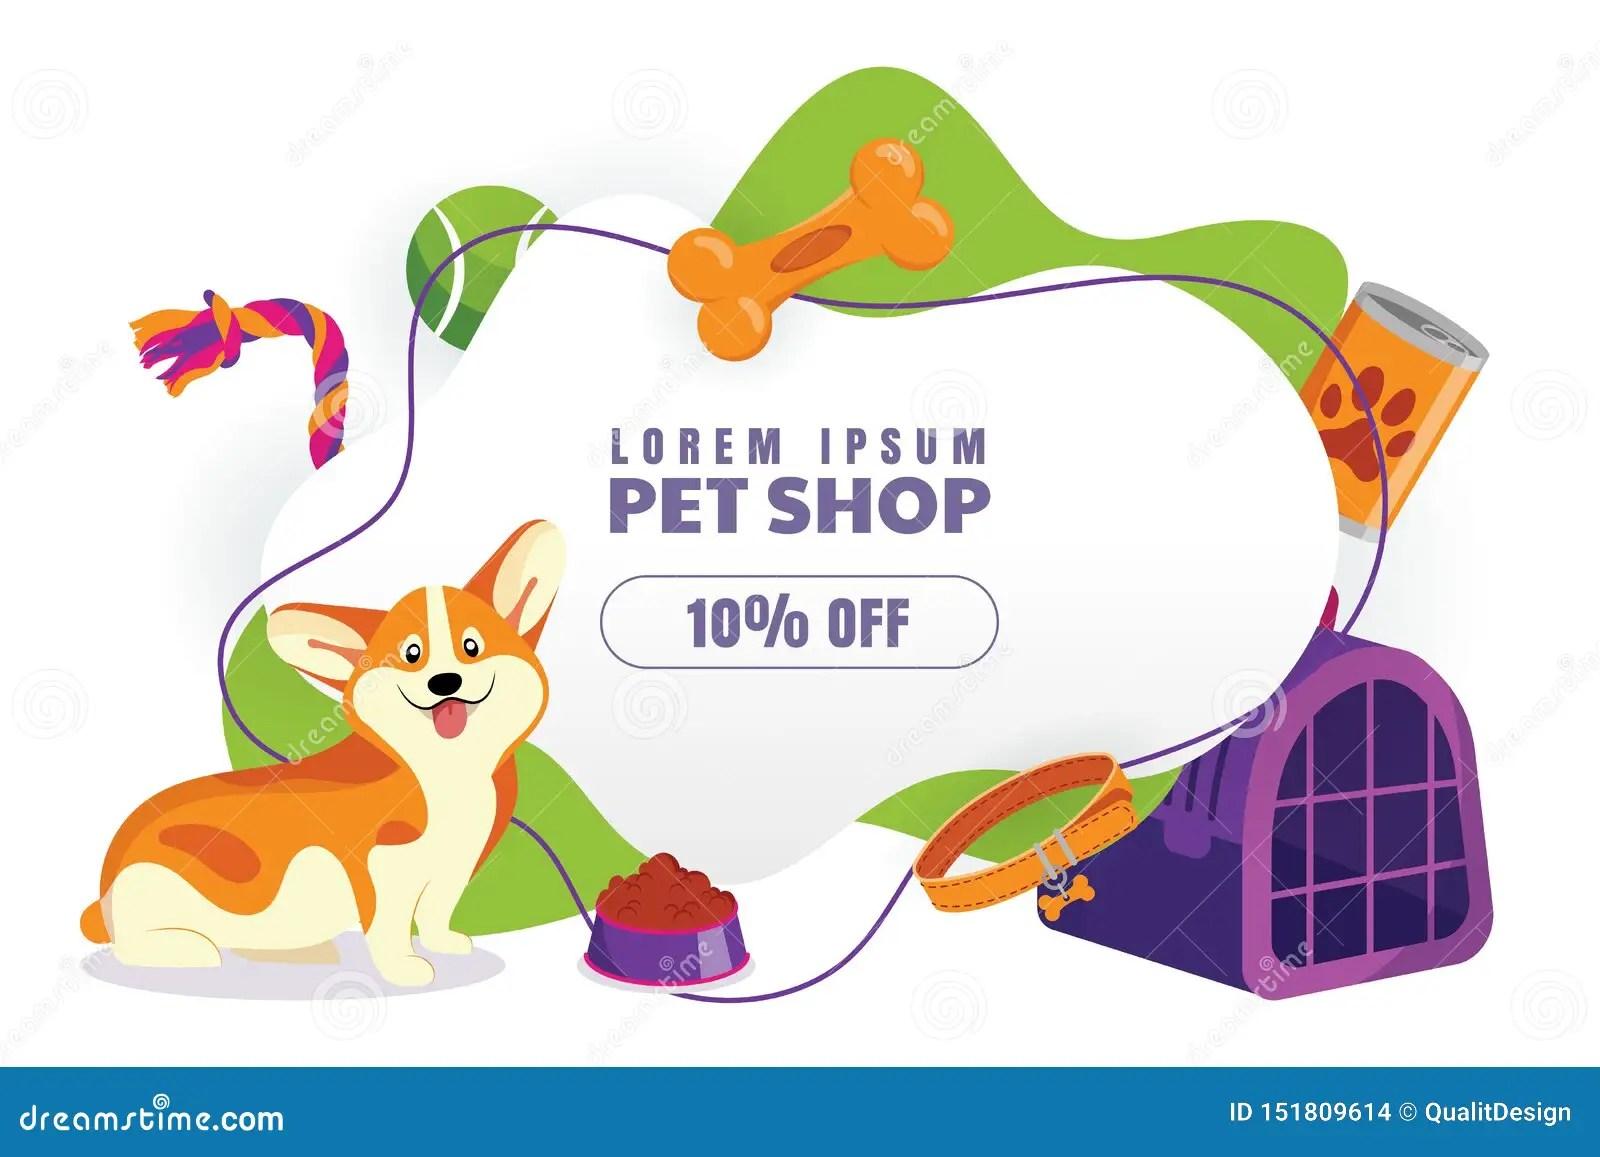 https www dreamstime com pet shop sale poster banner design template vector cartoon illustration animal foods accessories toys store pet shop image151809614